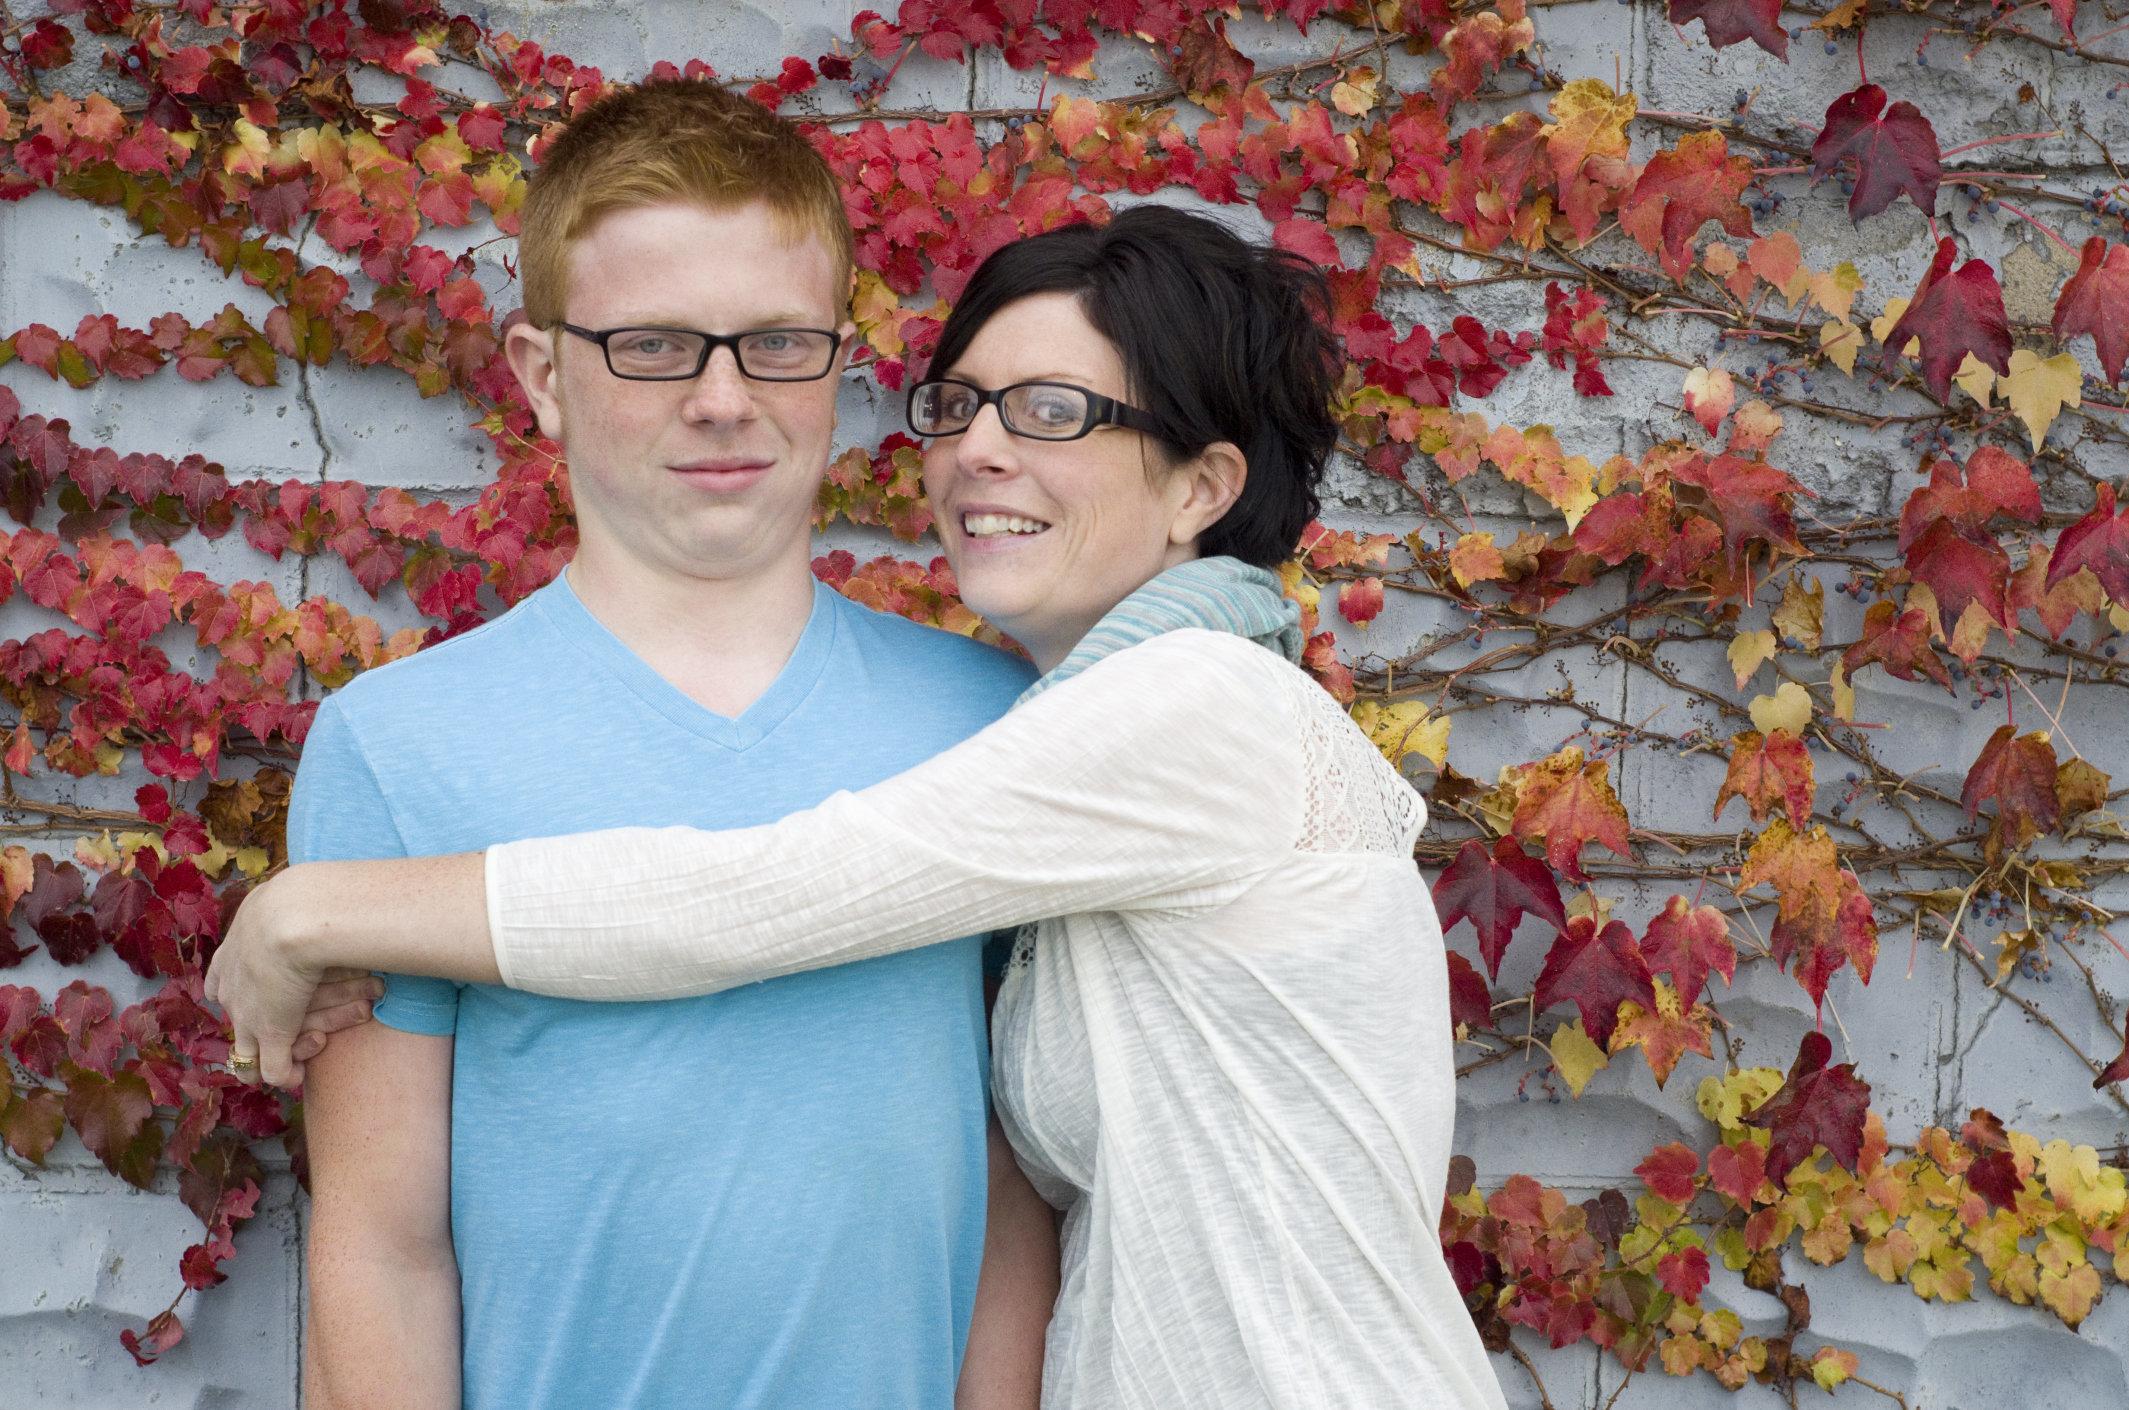 Teen boy refuses to hug his mom back